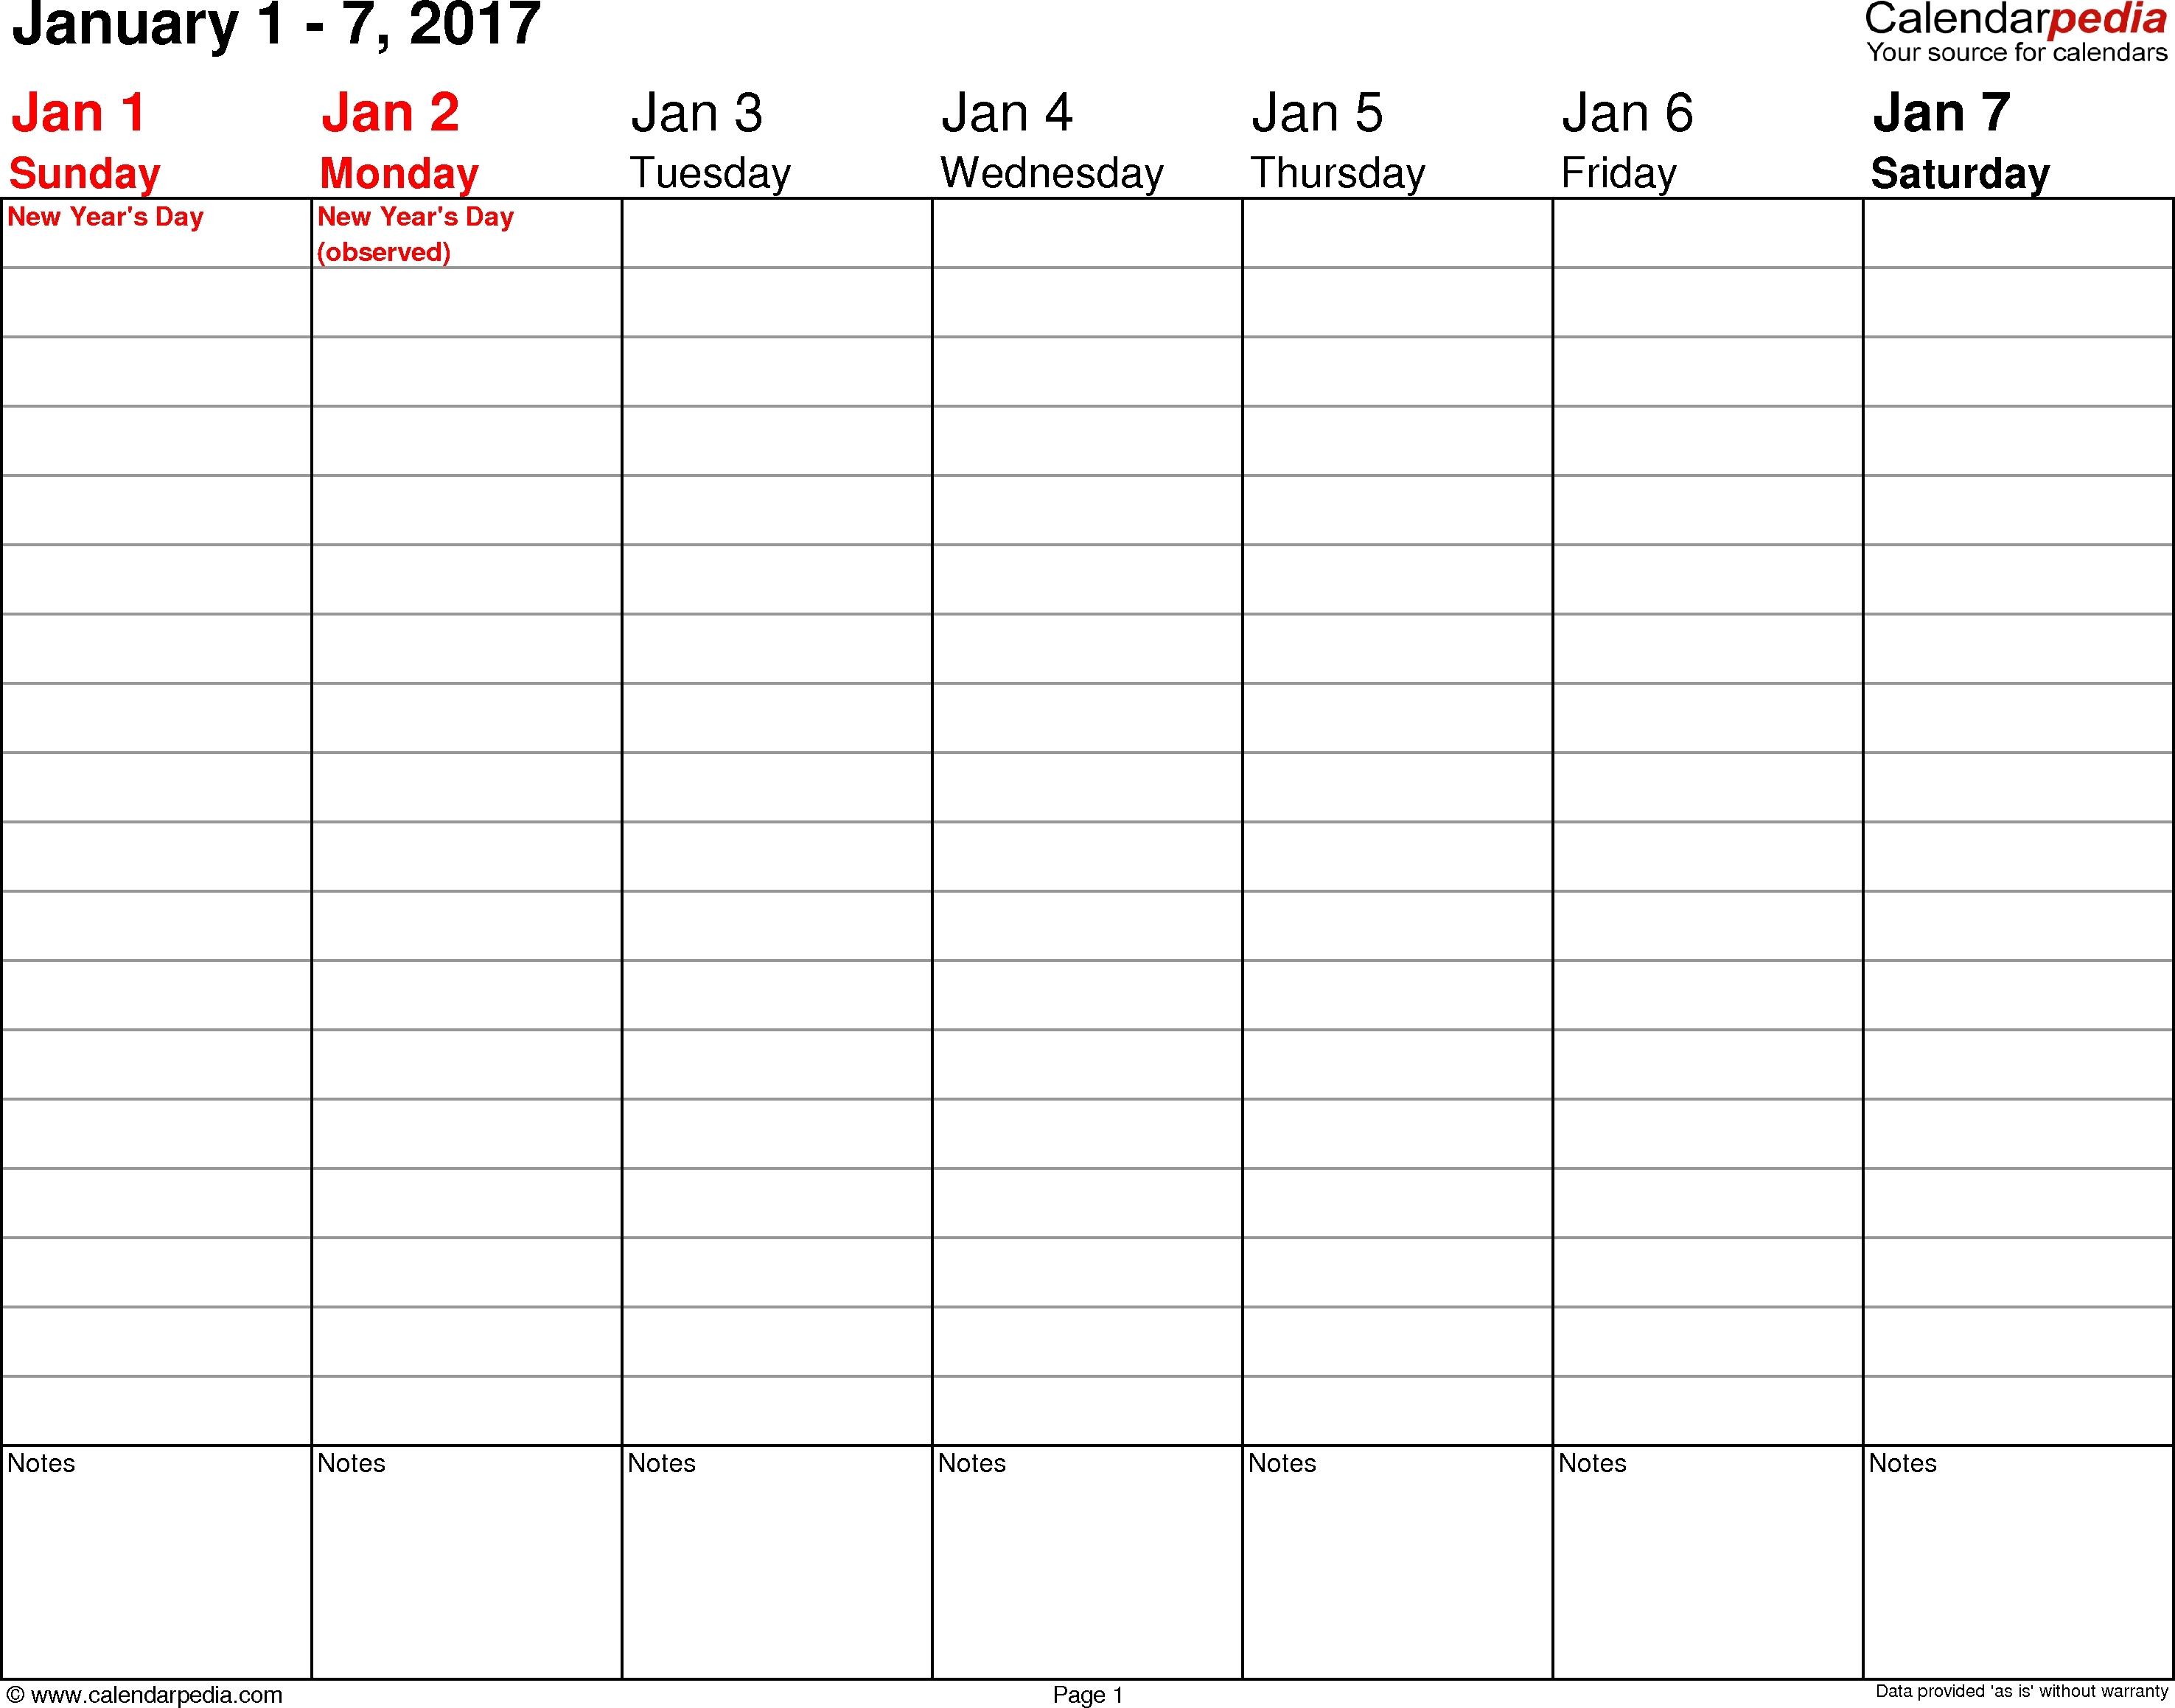 Printable Weekly Planner 2017 | Room Surf with Free Printable Weekly Planner Calendar Template